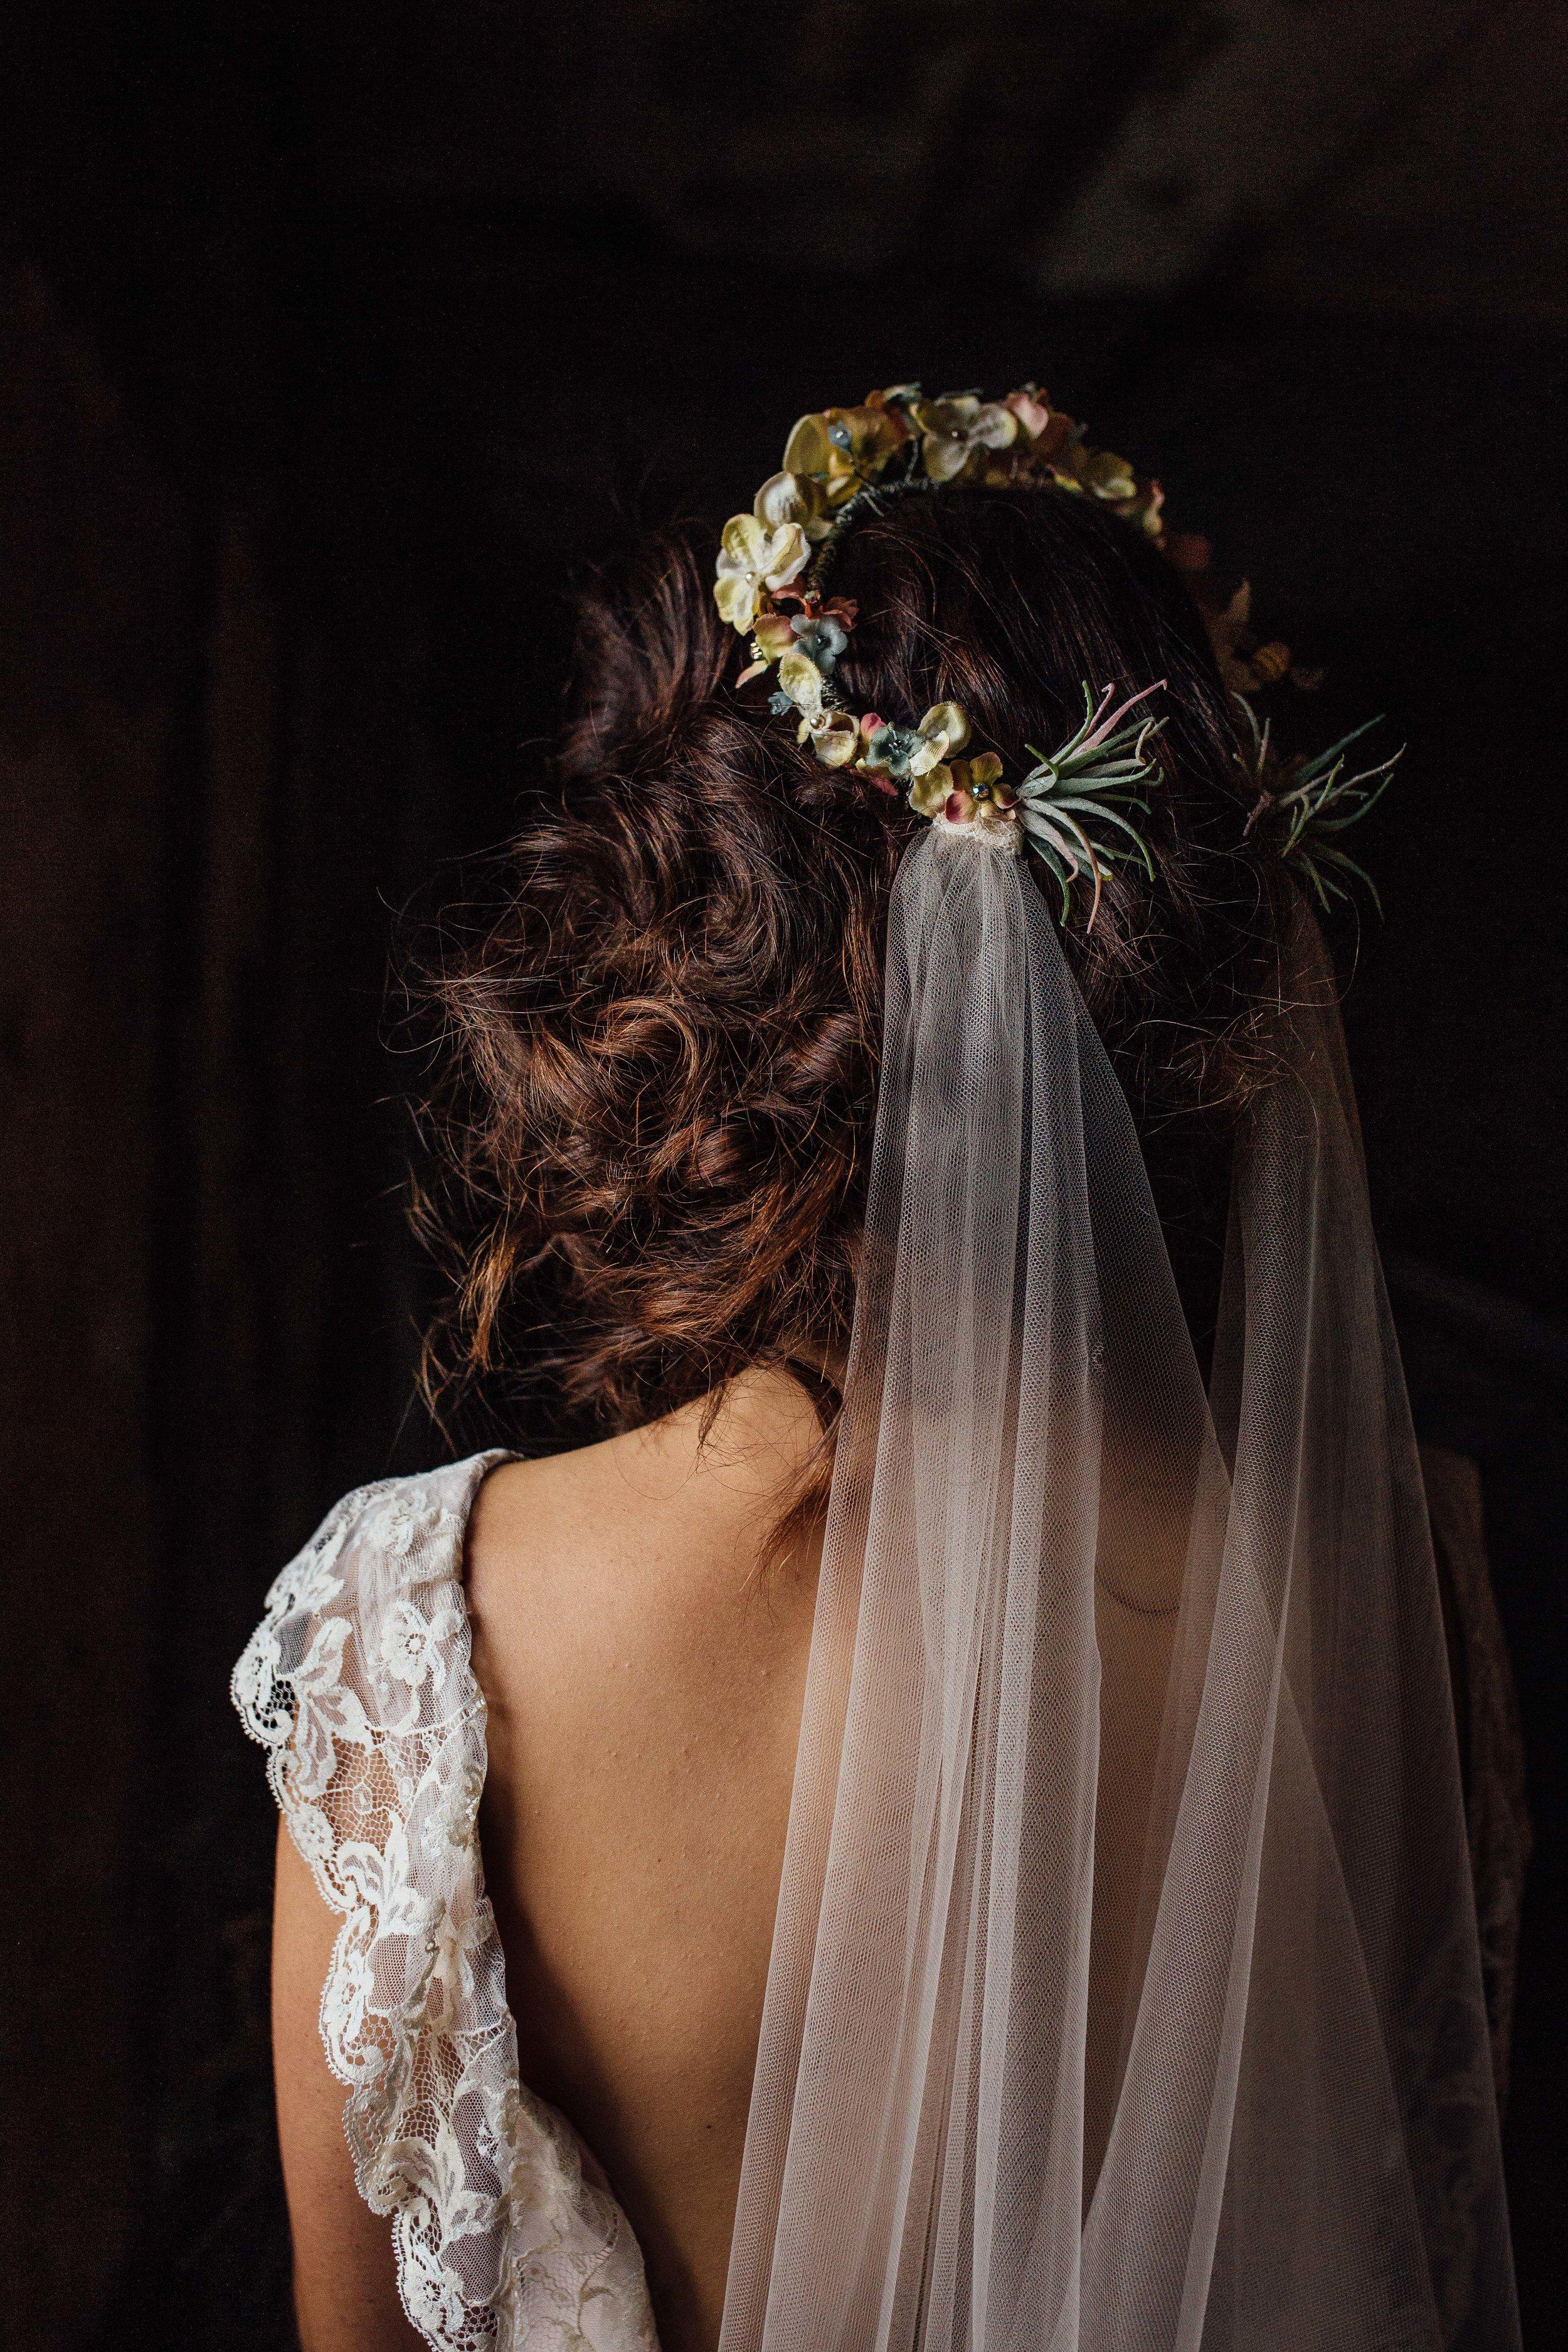 Katy-Bespoke-Veil-Sheffield-Wedding-Wes-Anderson-Susanna-Greening-Derbyshire-25